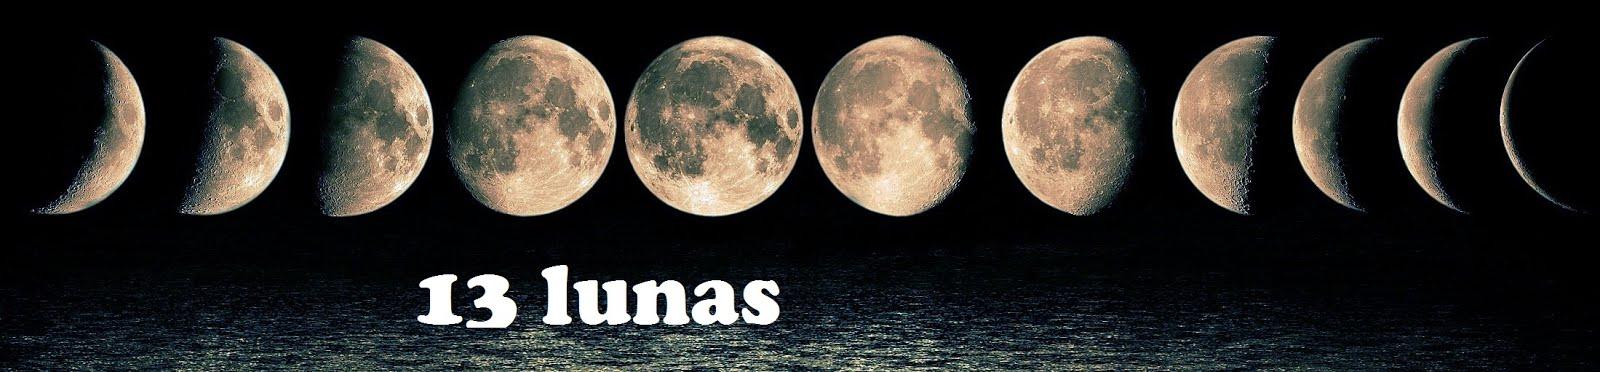 13lunas